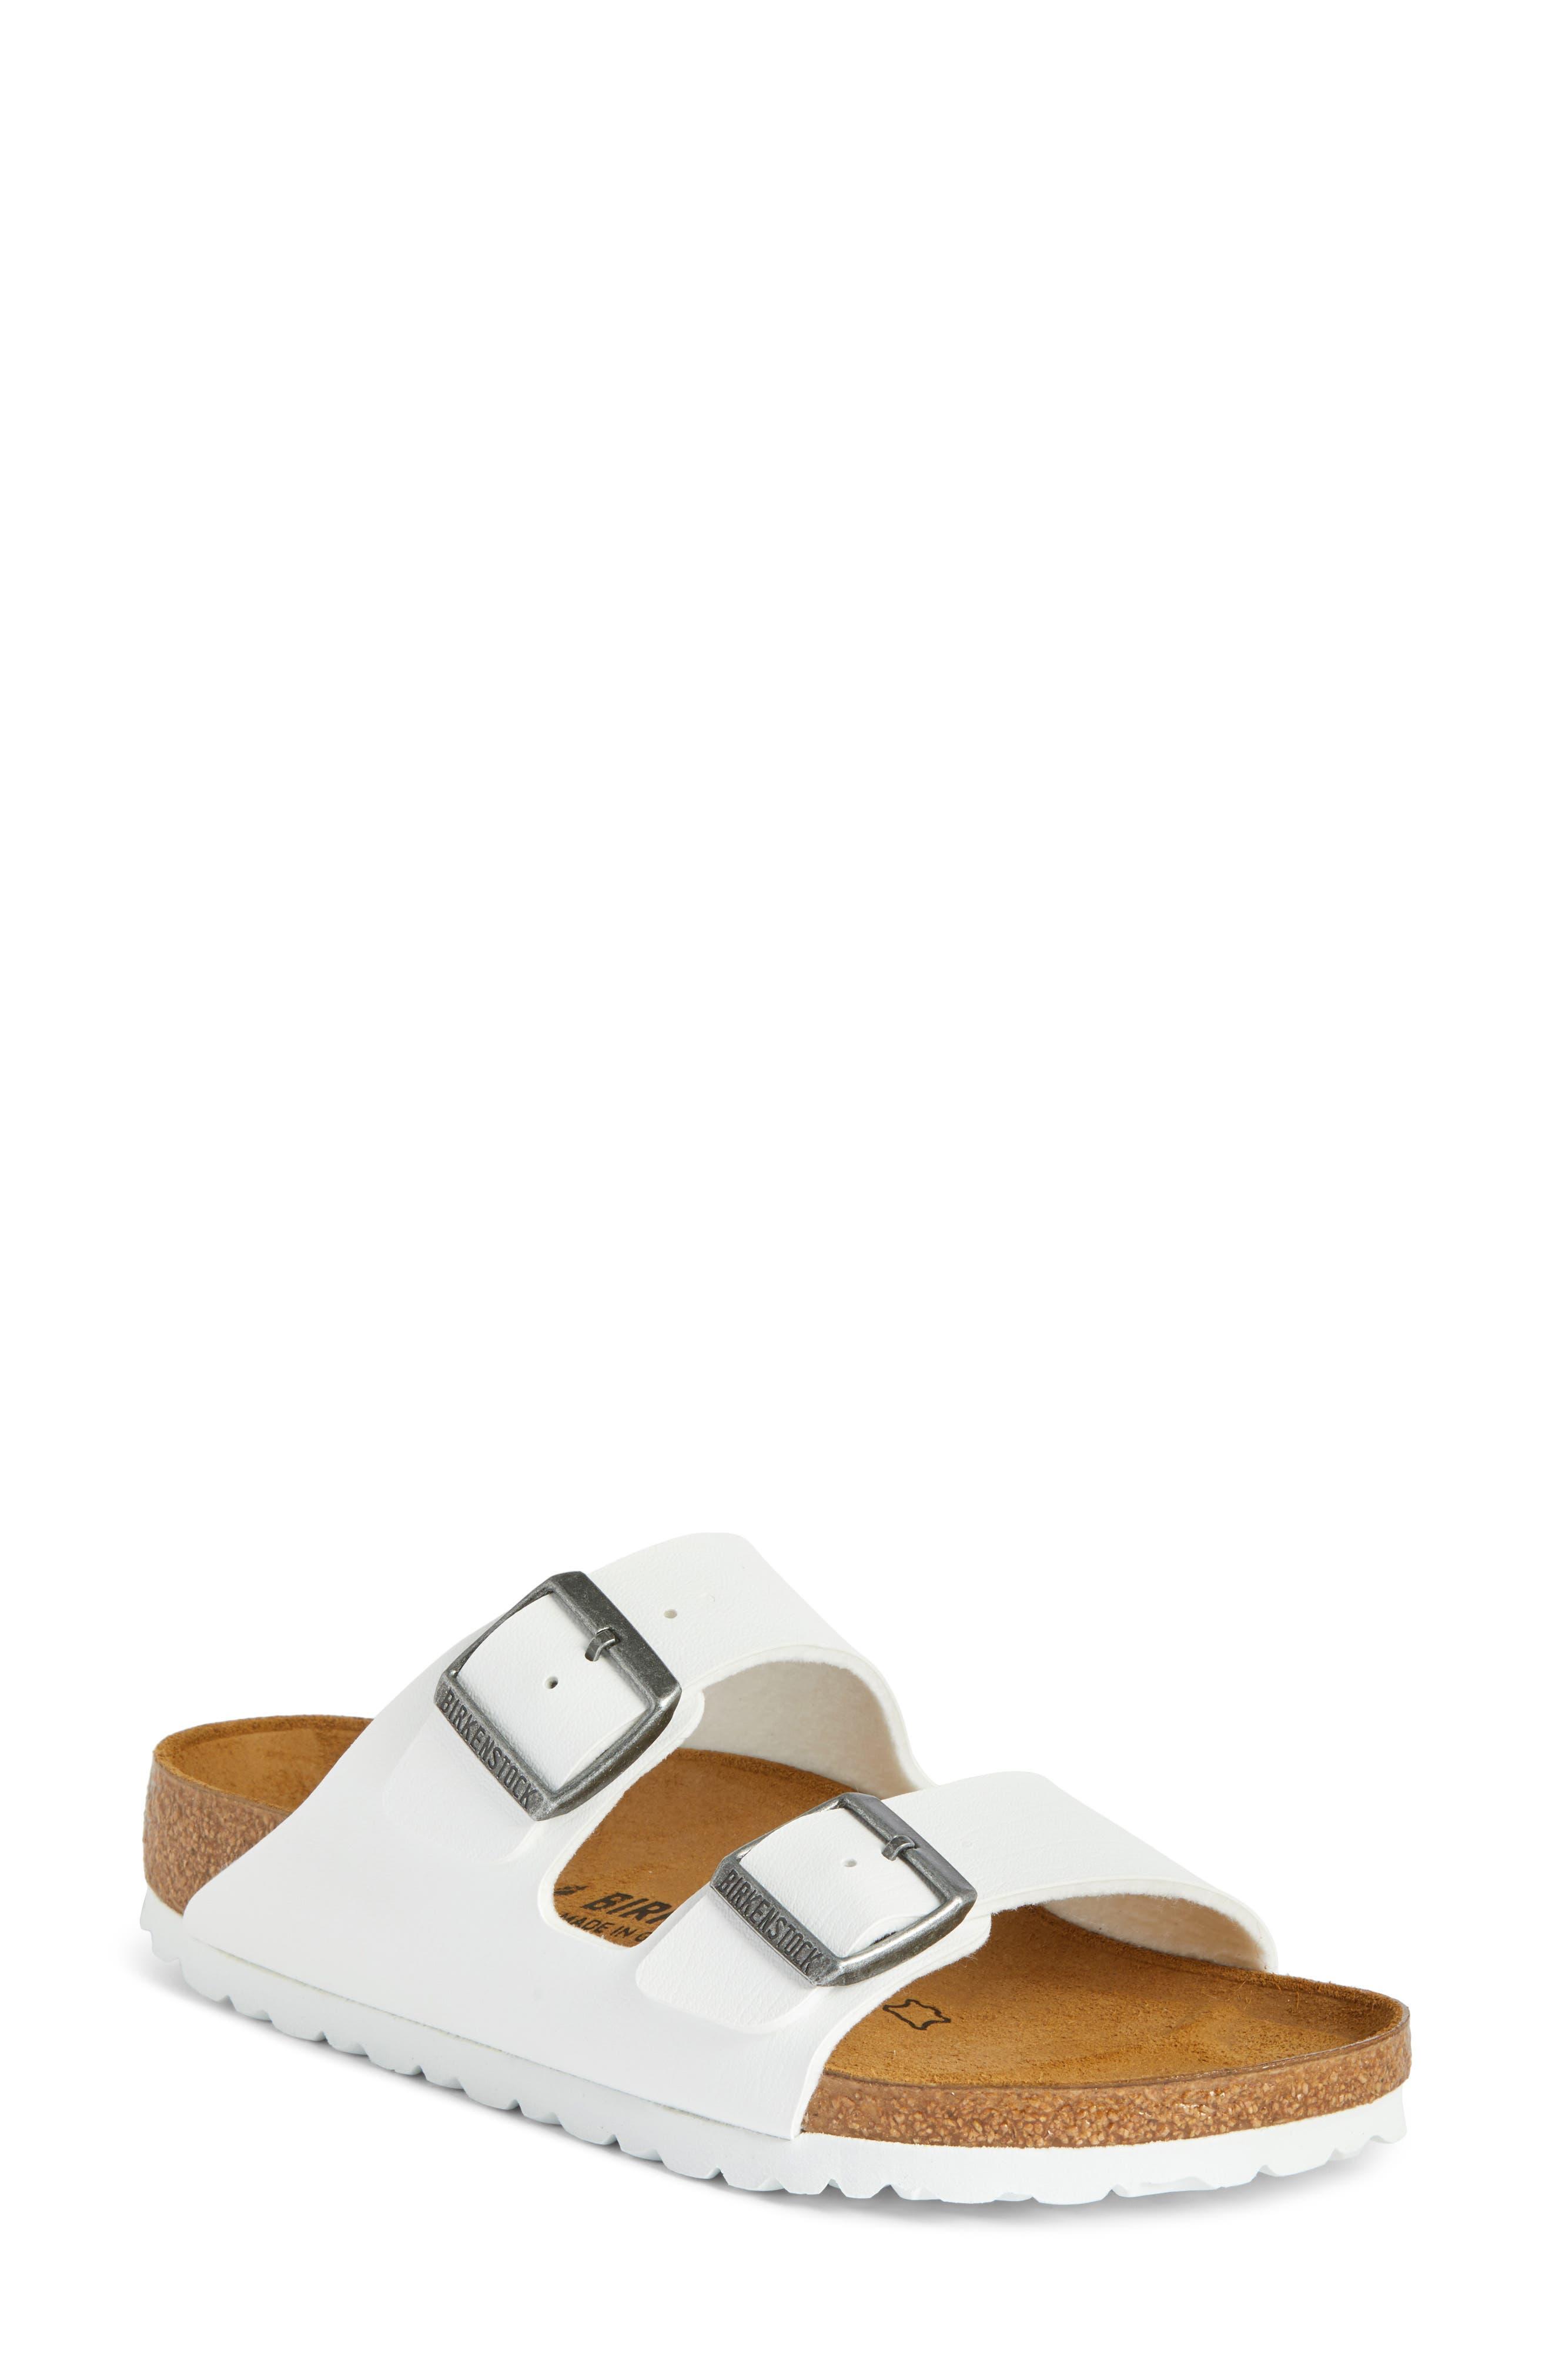 BIRKENSTOCK 'Arizona' White Birko-Flor Sandal, Main, color, WHITE SYNTHETIC LEATHER